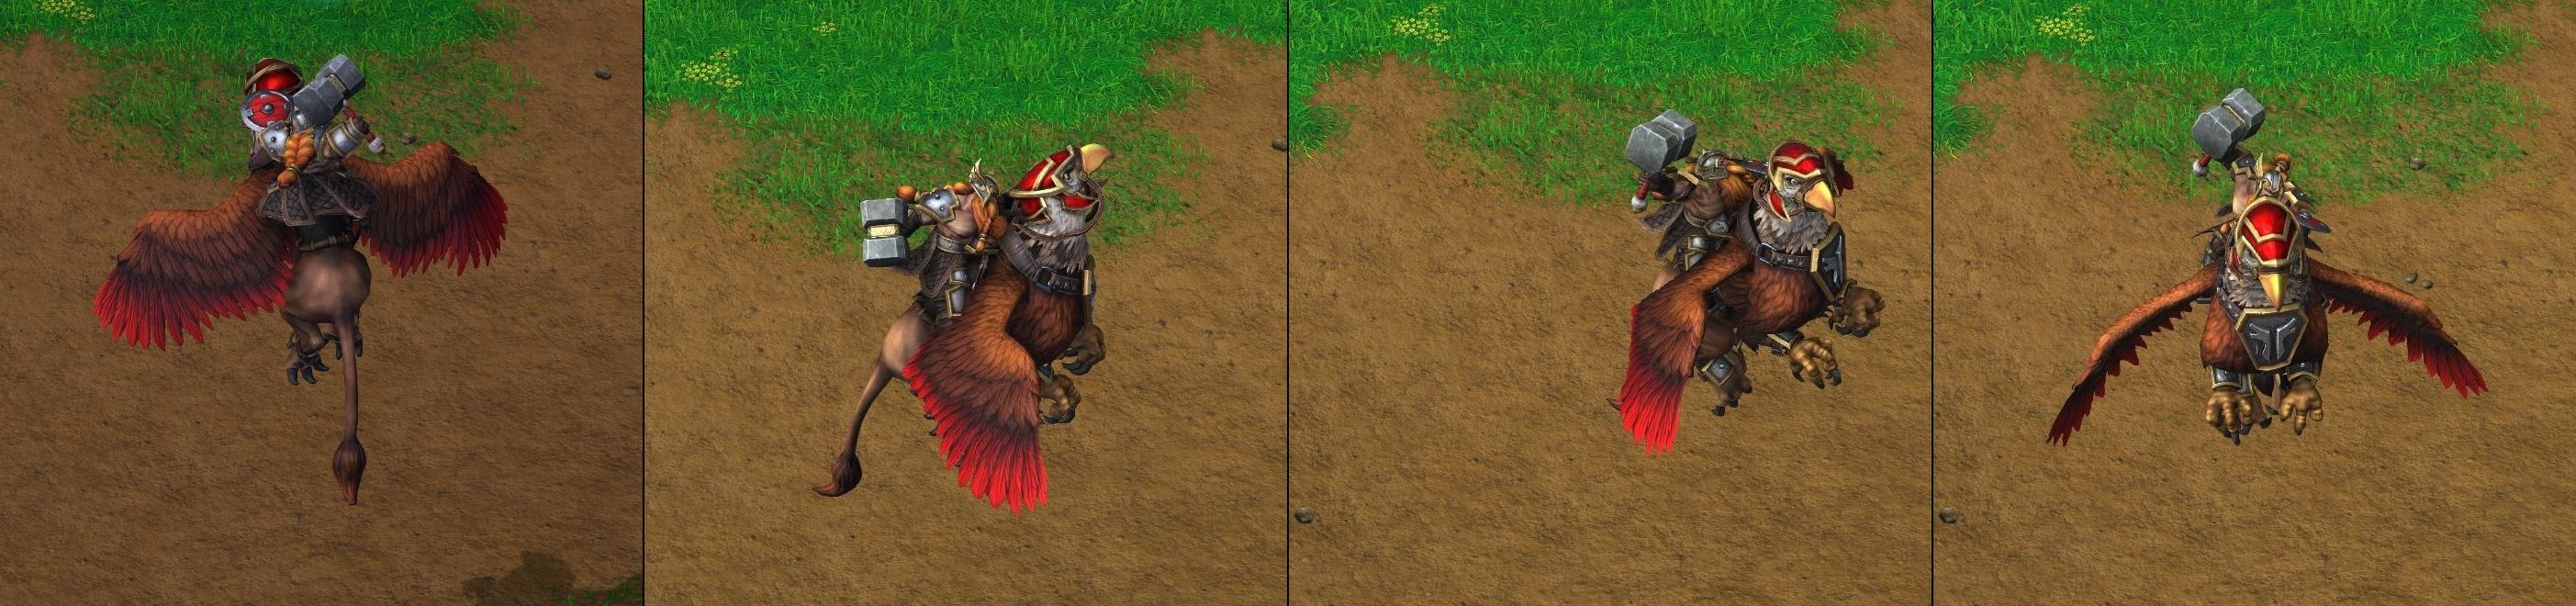 Warcraft III Reforged : Gryphon Rider